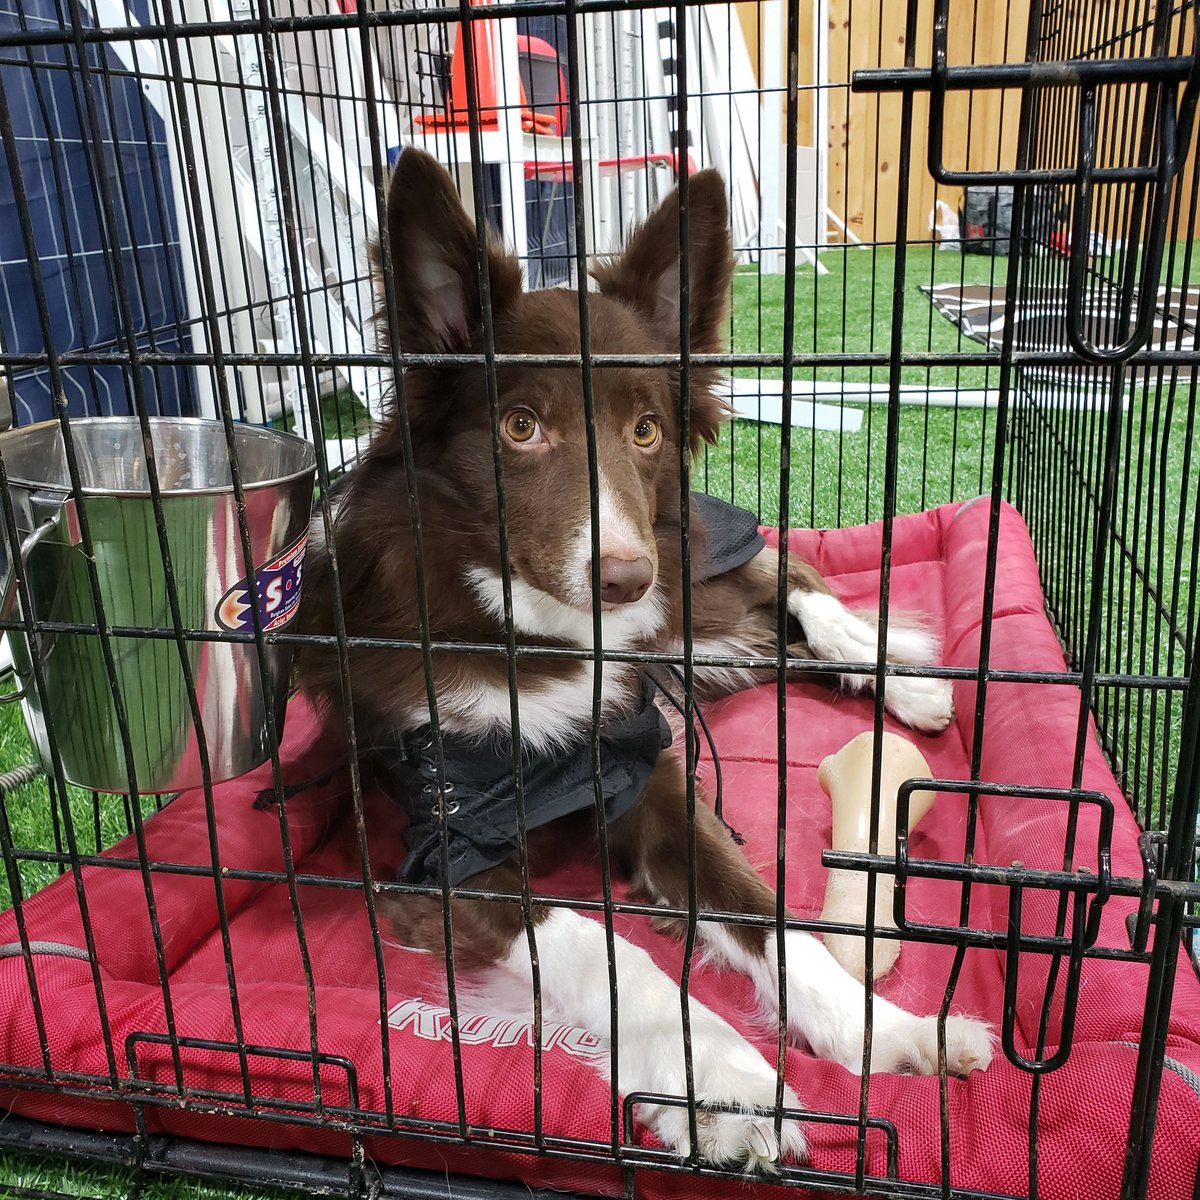 Winnie's #patientlywaiting for his turn to play #agility #dog #bordercollie #bordercollies #reddog #dogagility #agilitydog #agilitywithamanda #dogadventures #doglooks #dogwaiting #waitingdog #kong #kongbed @company_kong #backontrack #backontrackdog @BackOnTrackProdpic.twitter.com/6DUGqYbXMQ